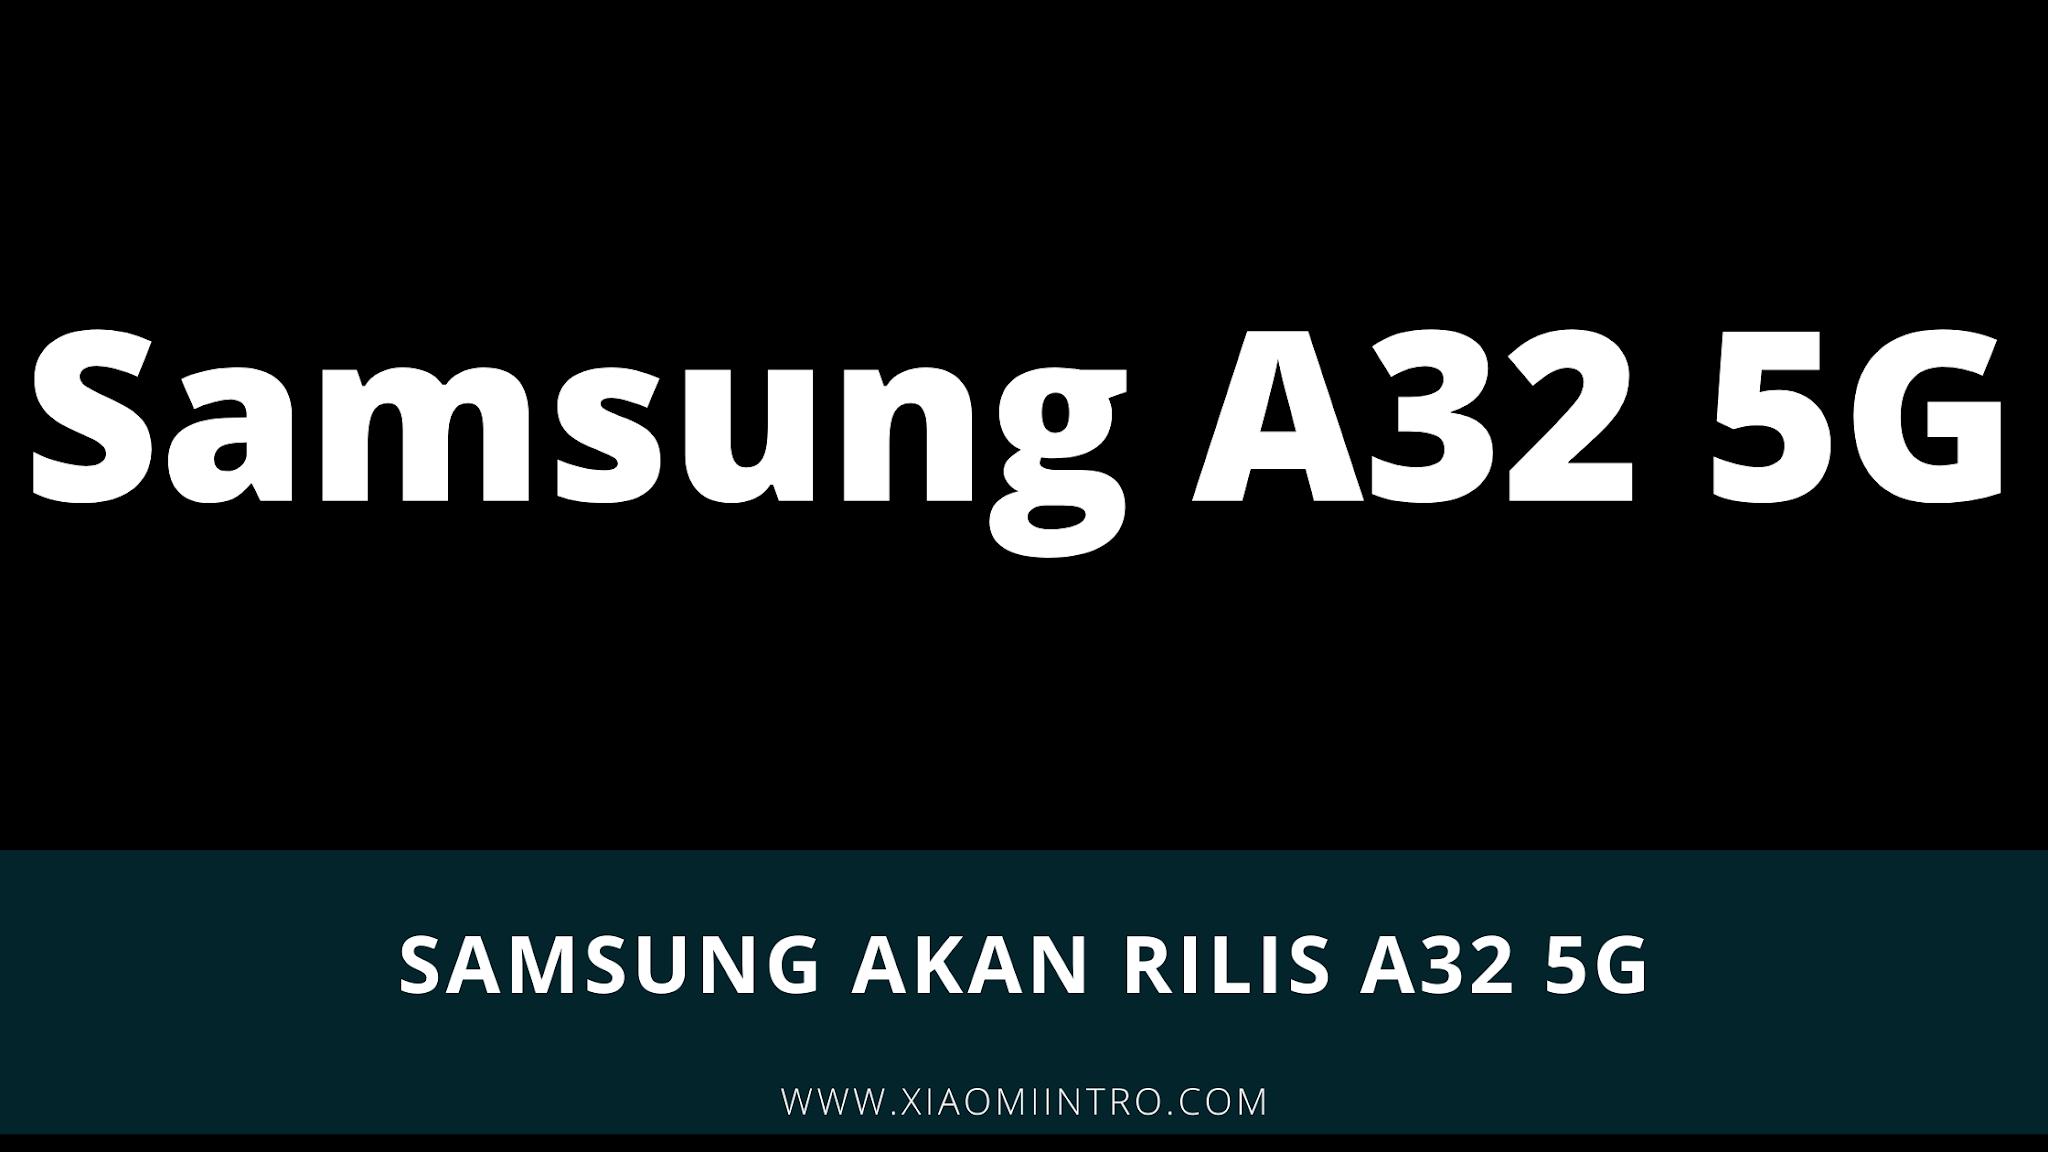 Samsung Akan Rilis Galaxy A32 5G